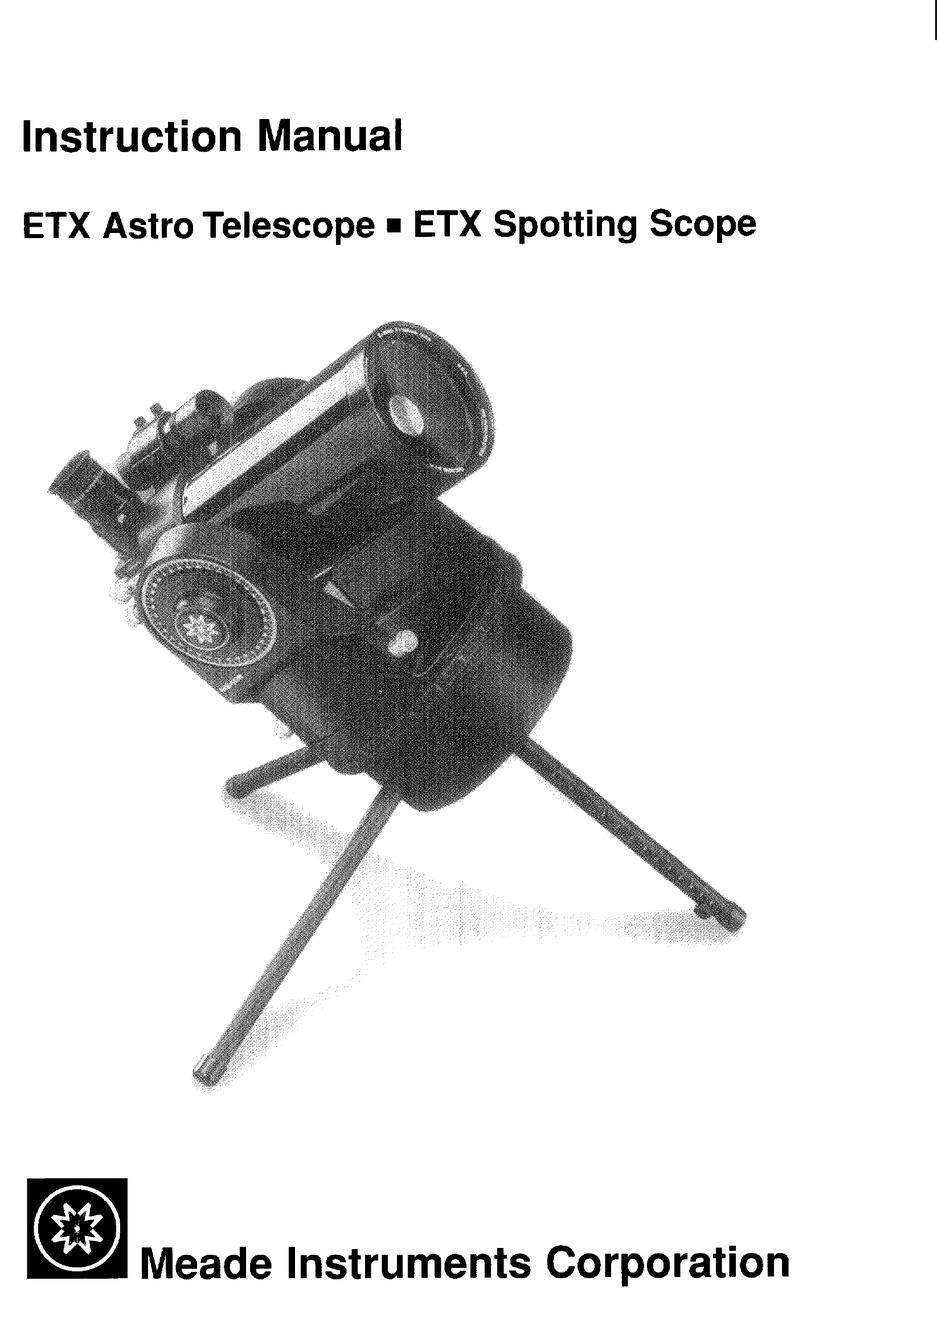 Meade Etx Astro Telescope Spotting